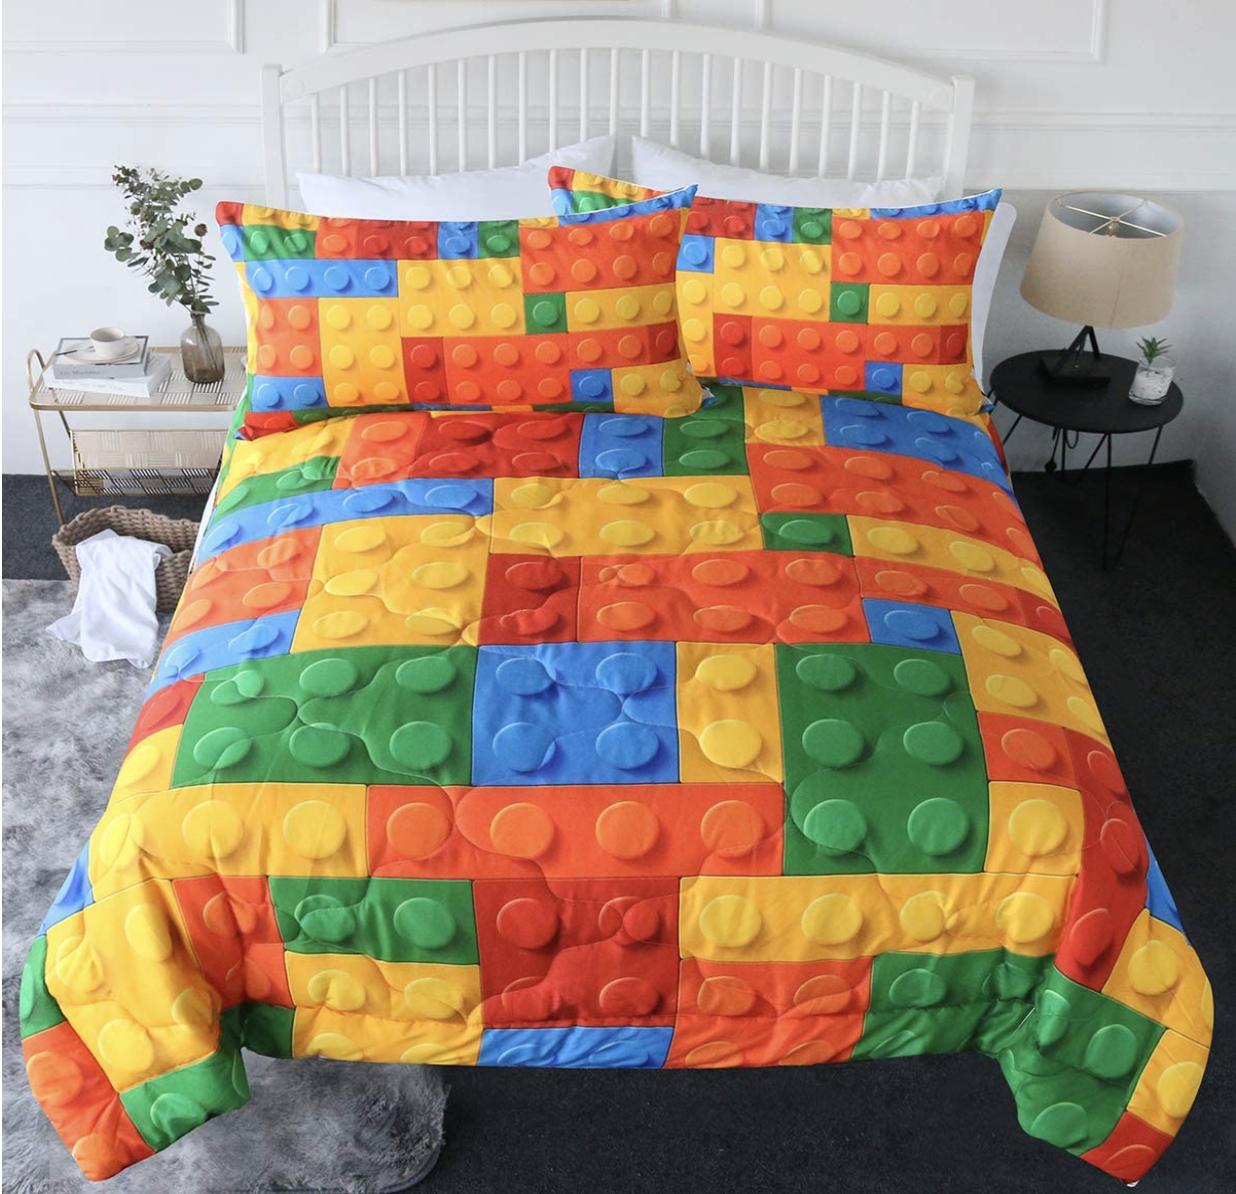 A comforter with a Lego bricks design